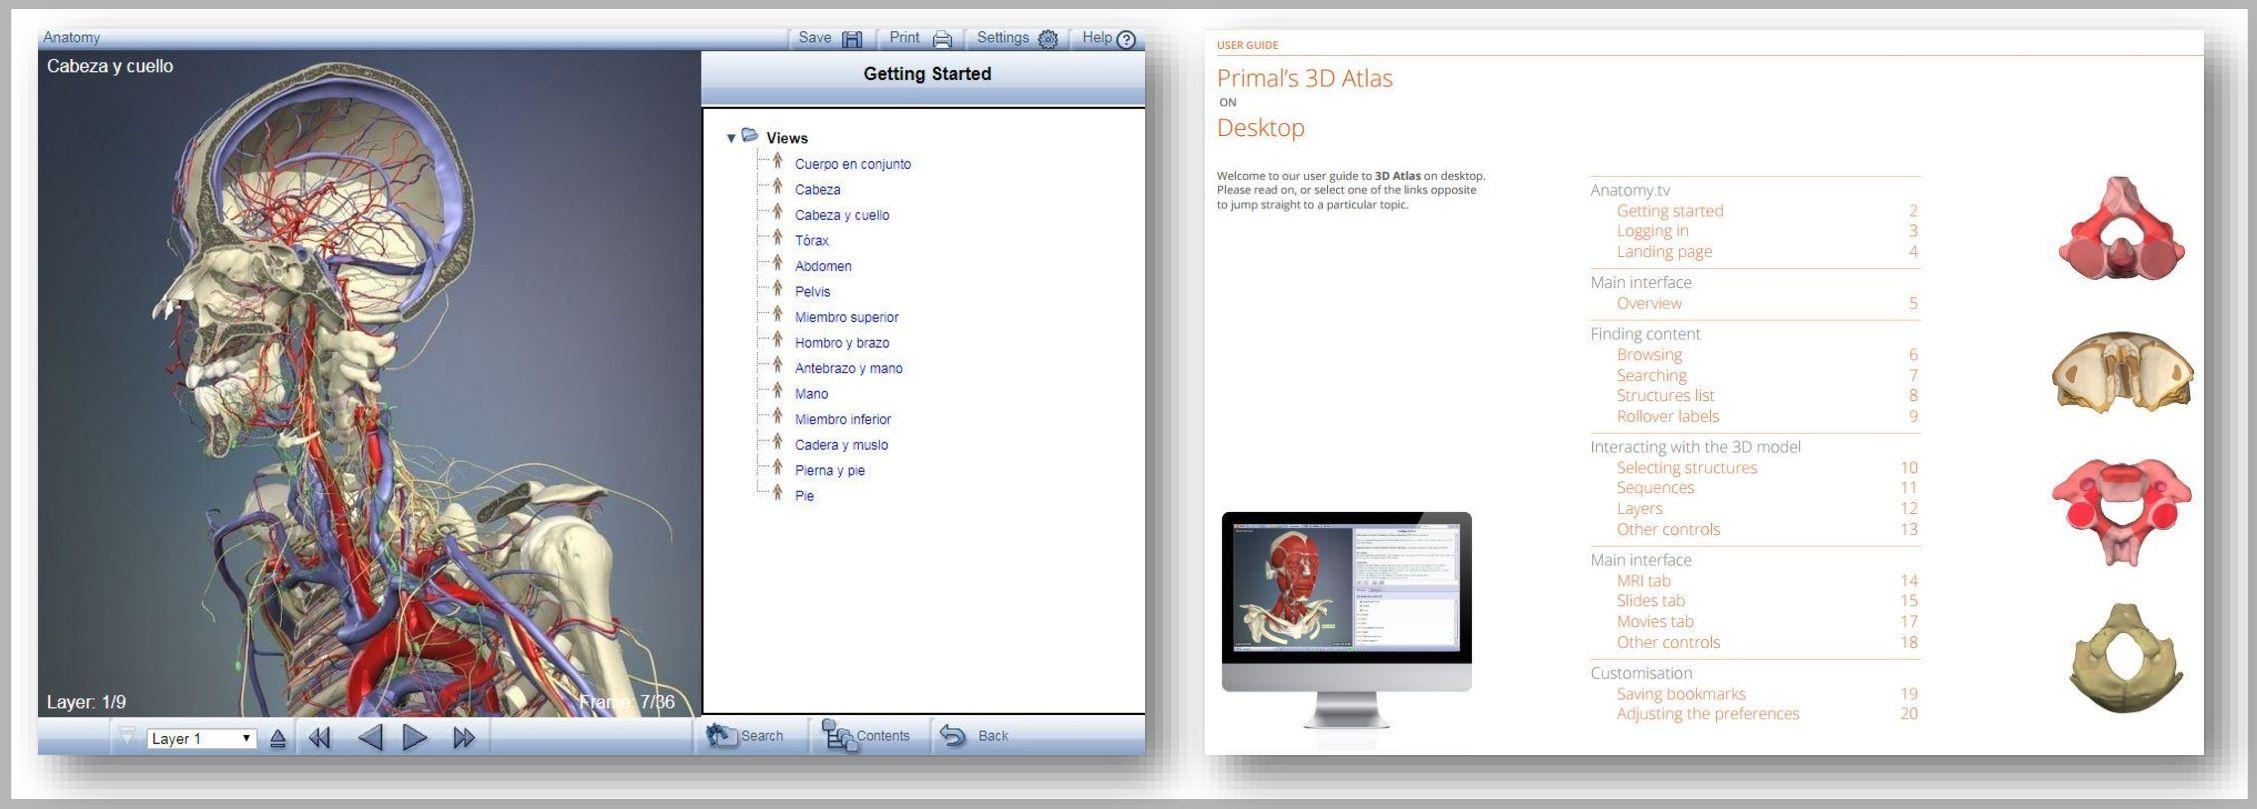 Primal\'s 3D Atlas: una herramienta imprescindible | Biblioteca CEU